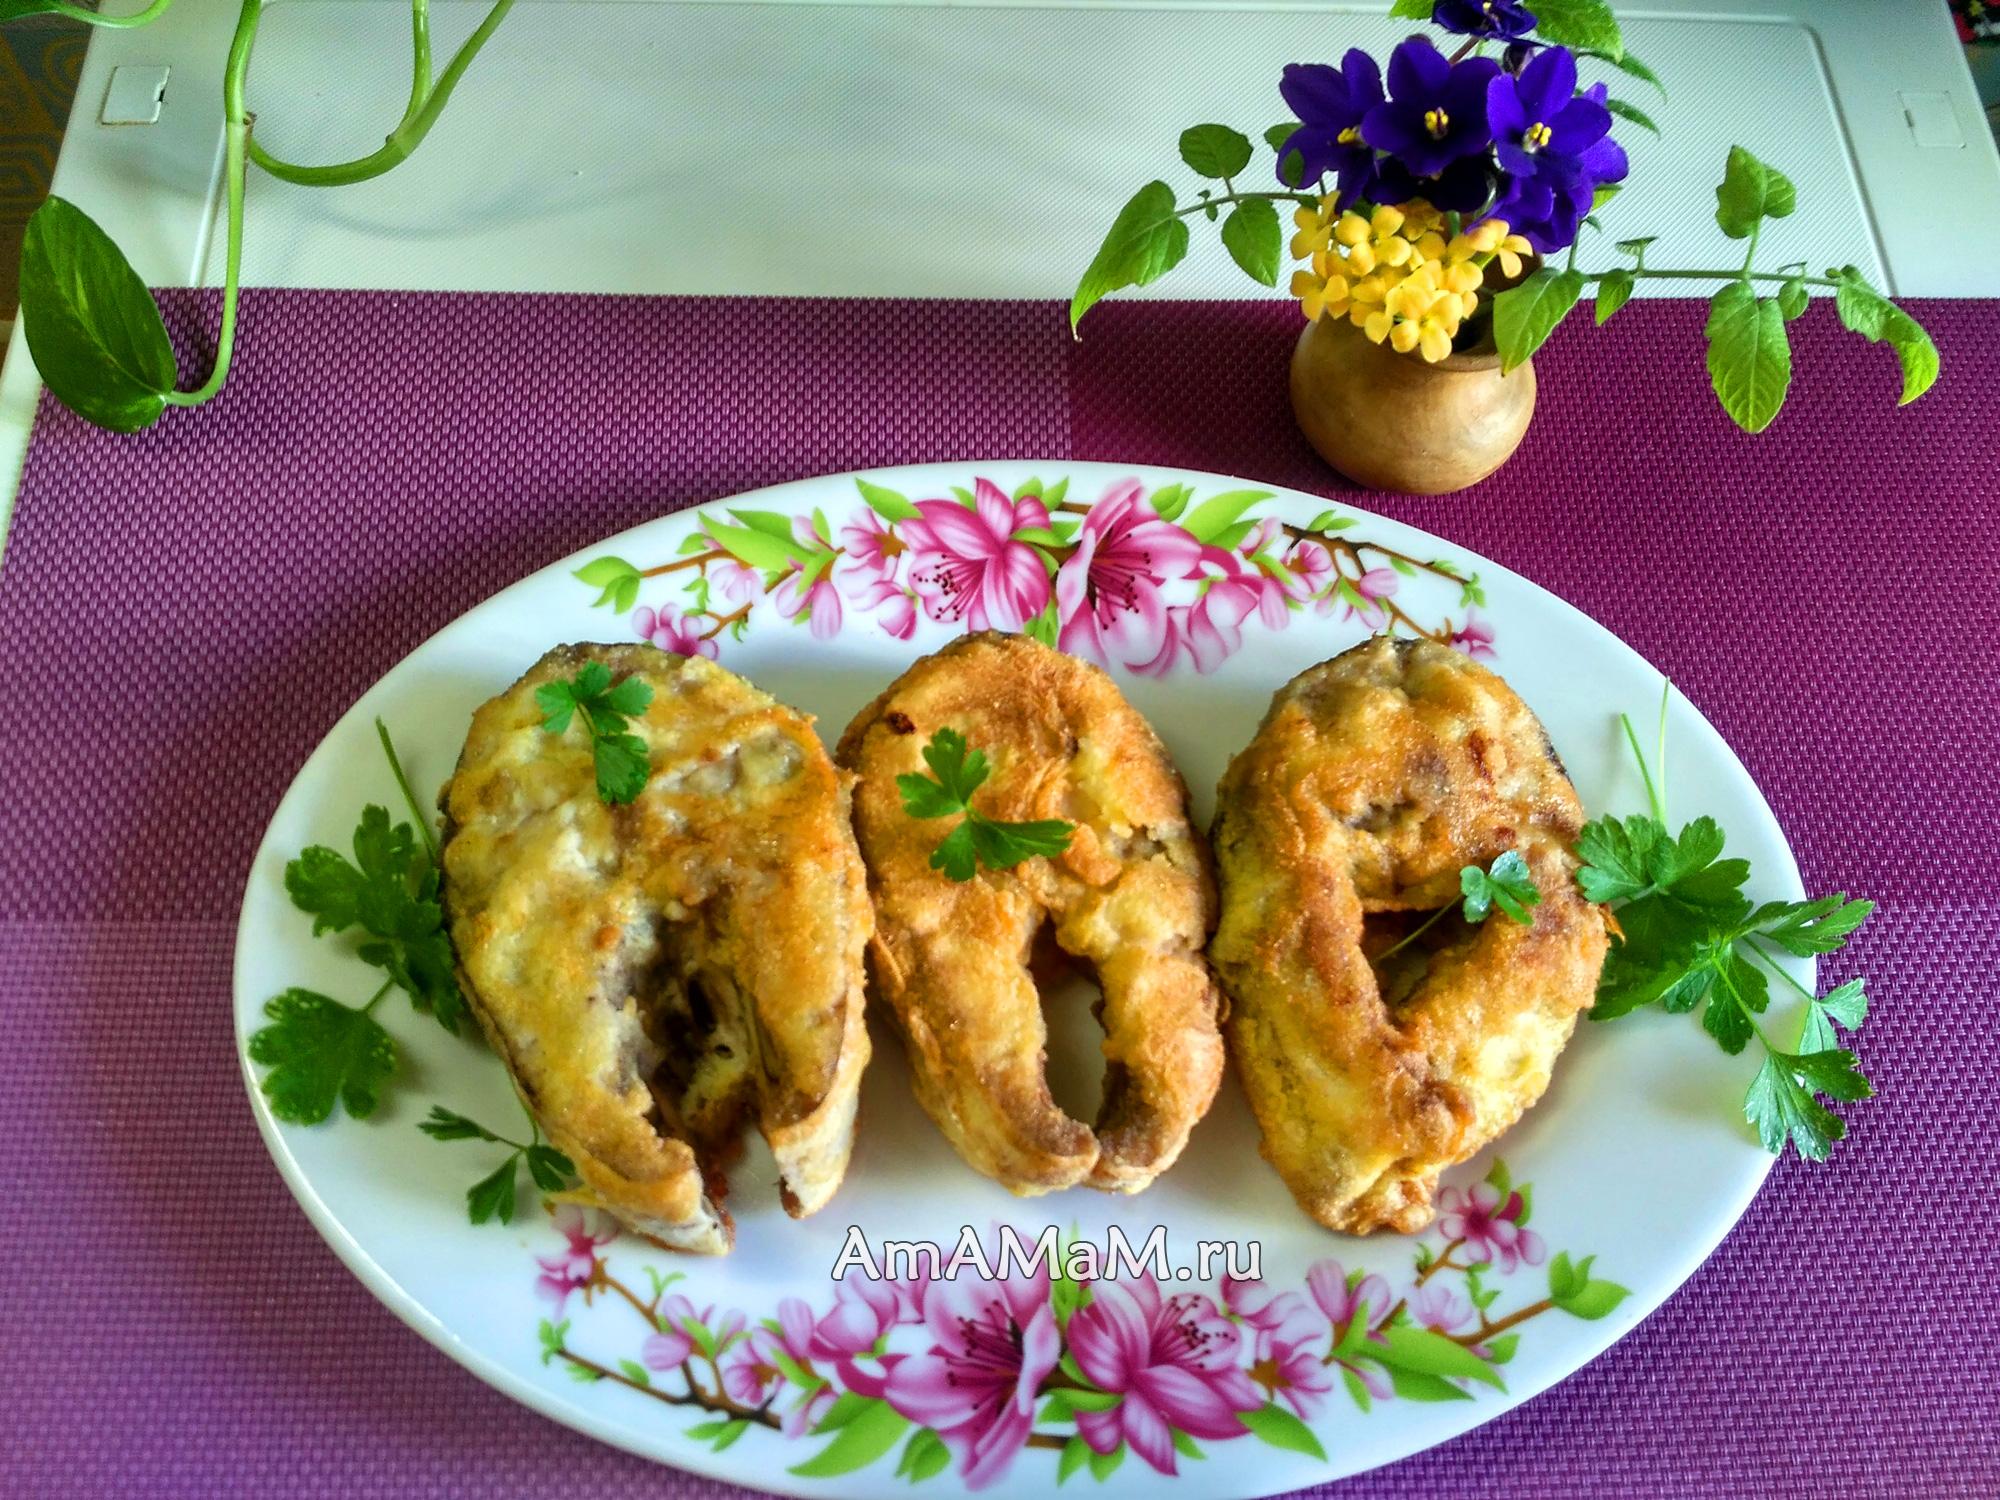 Рецепт жареной лакедры в кукурузной муке